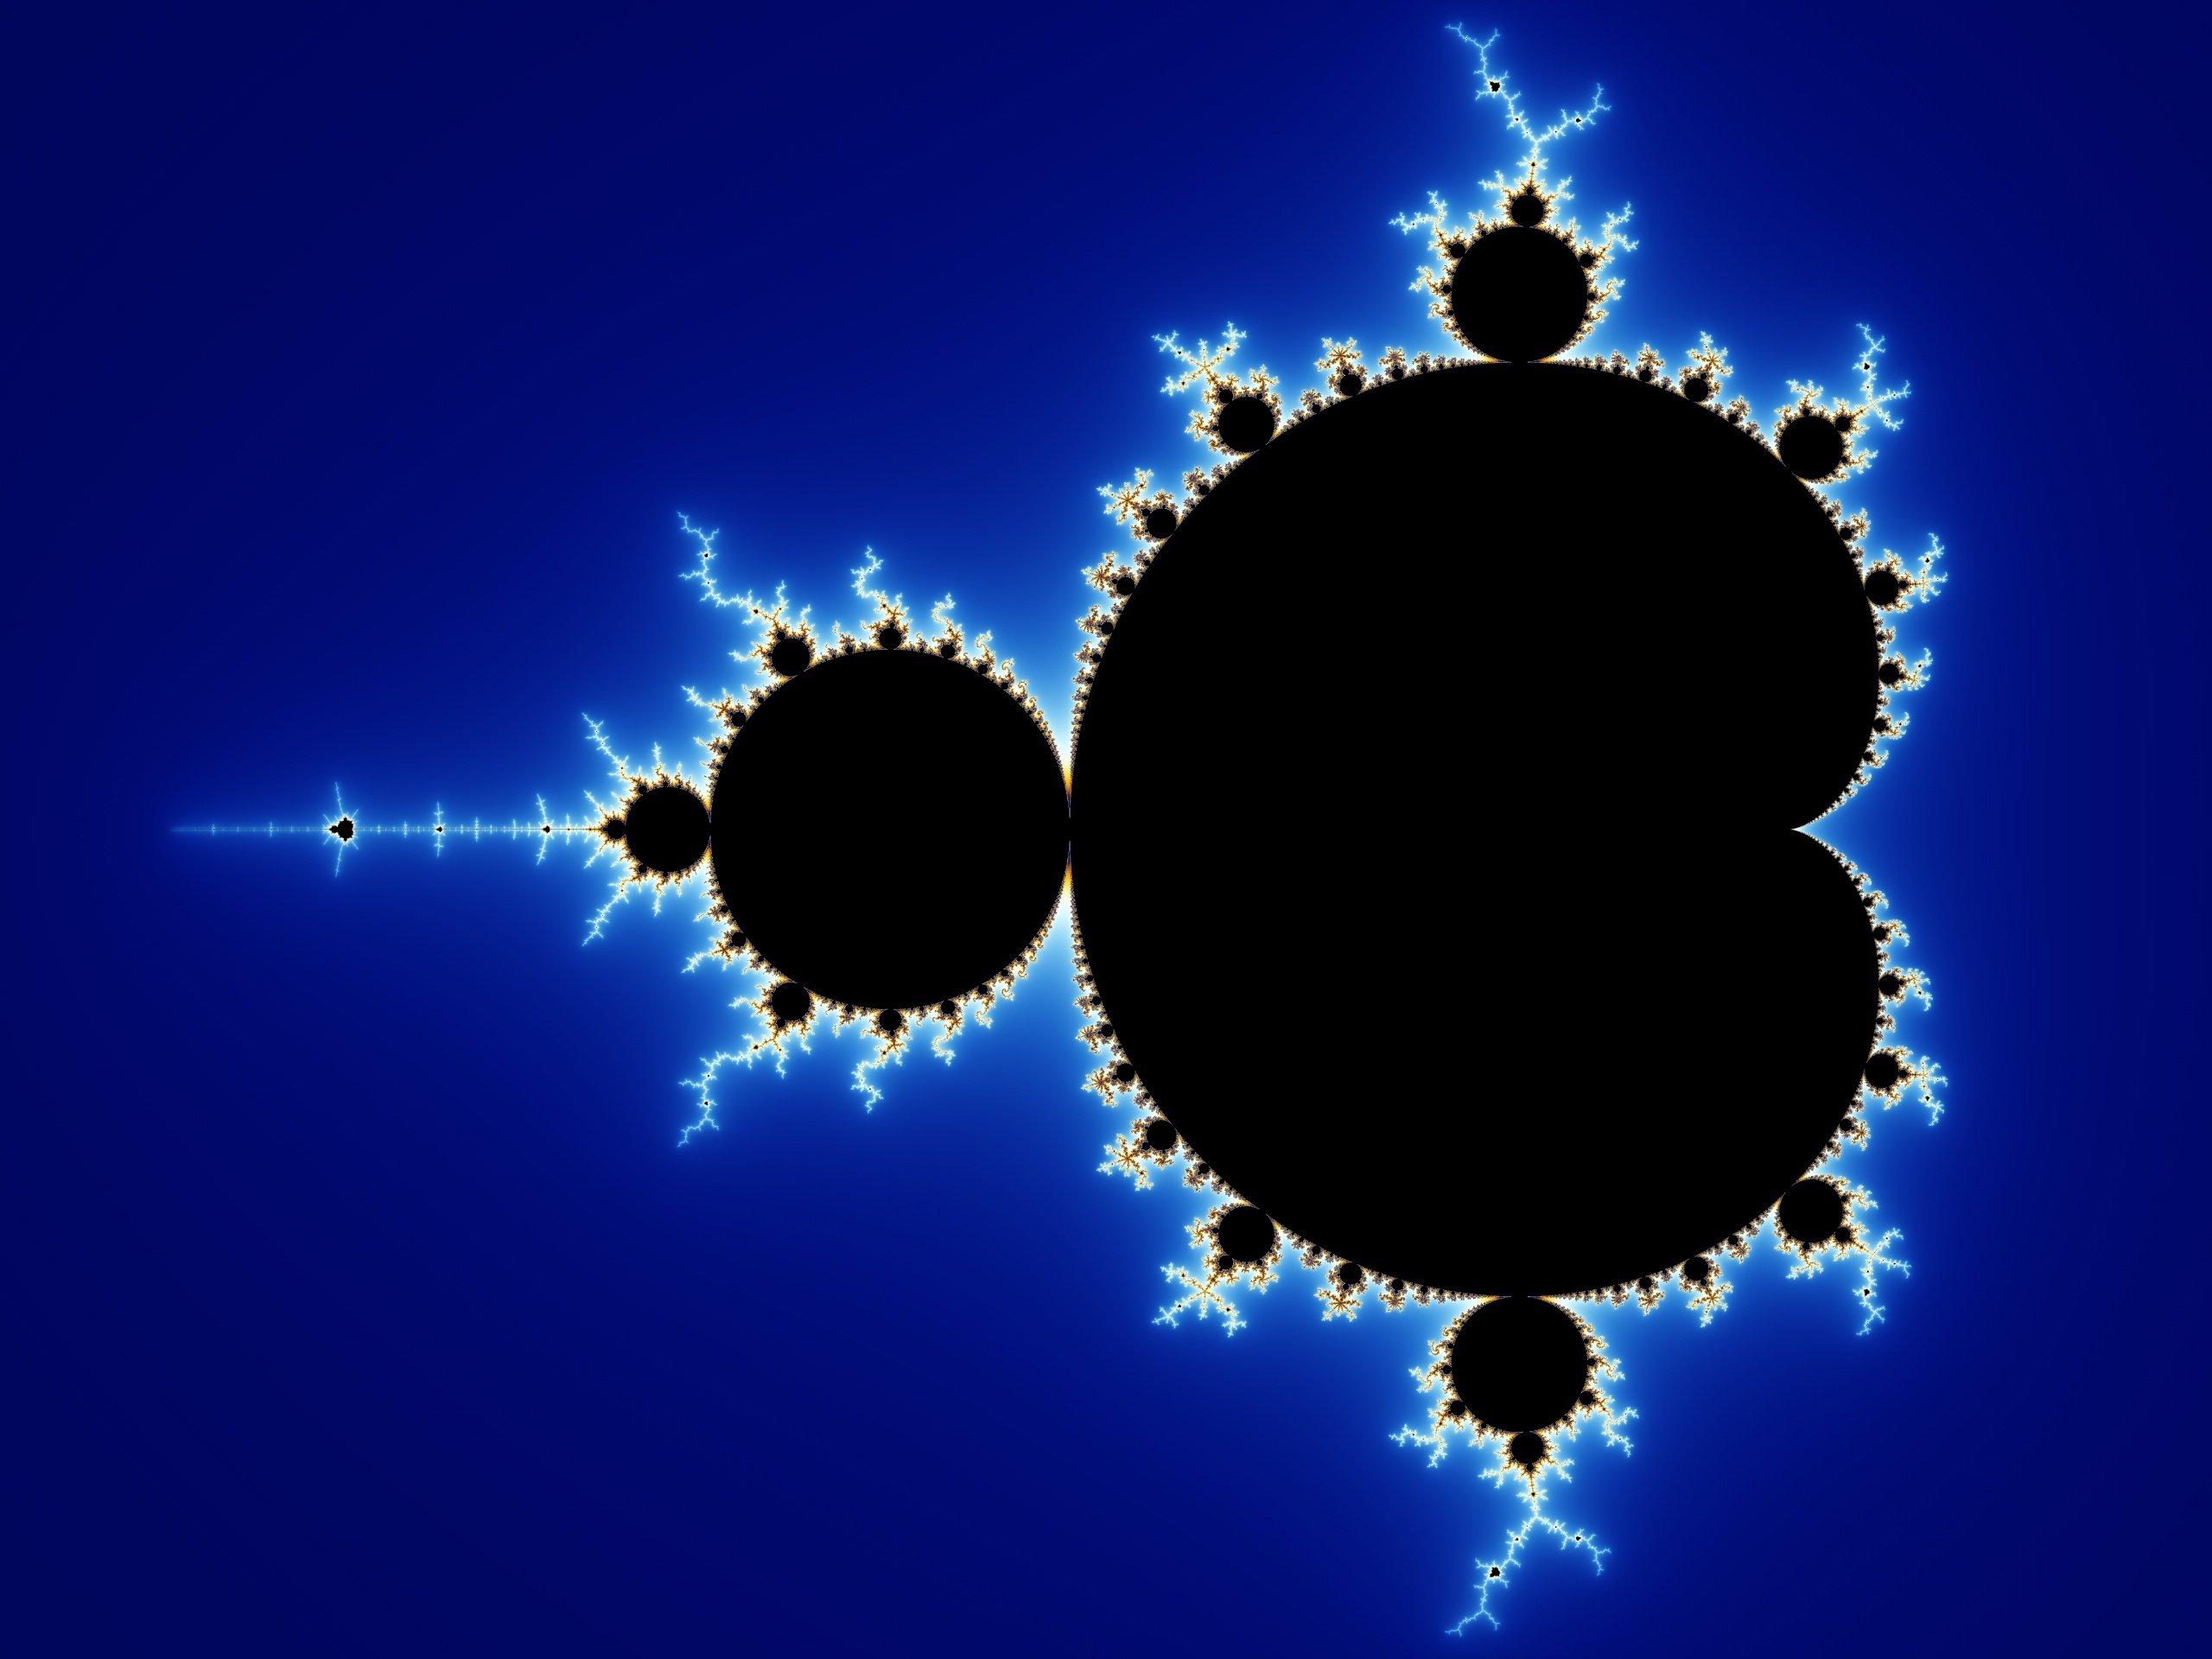 Fractal Mandelbrot Set